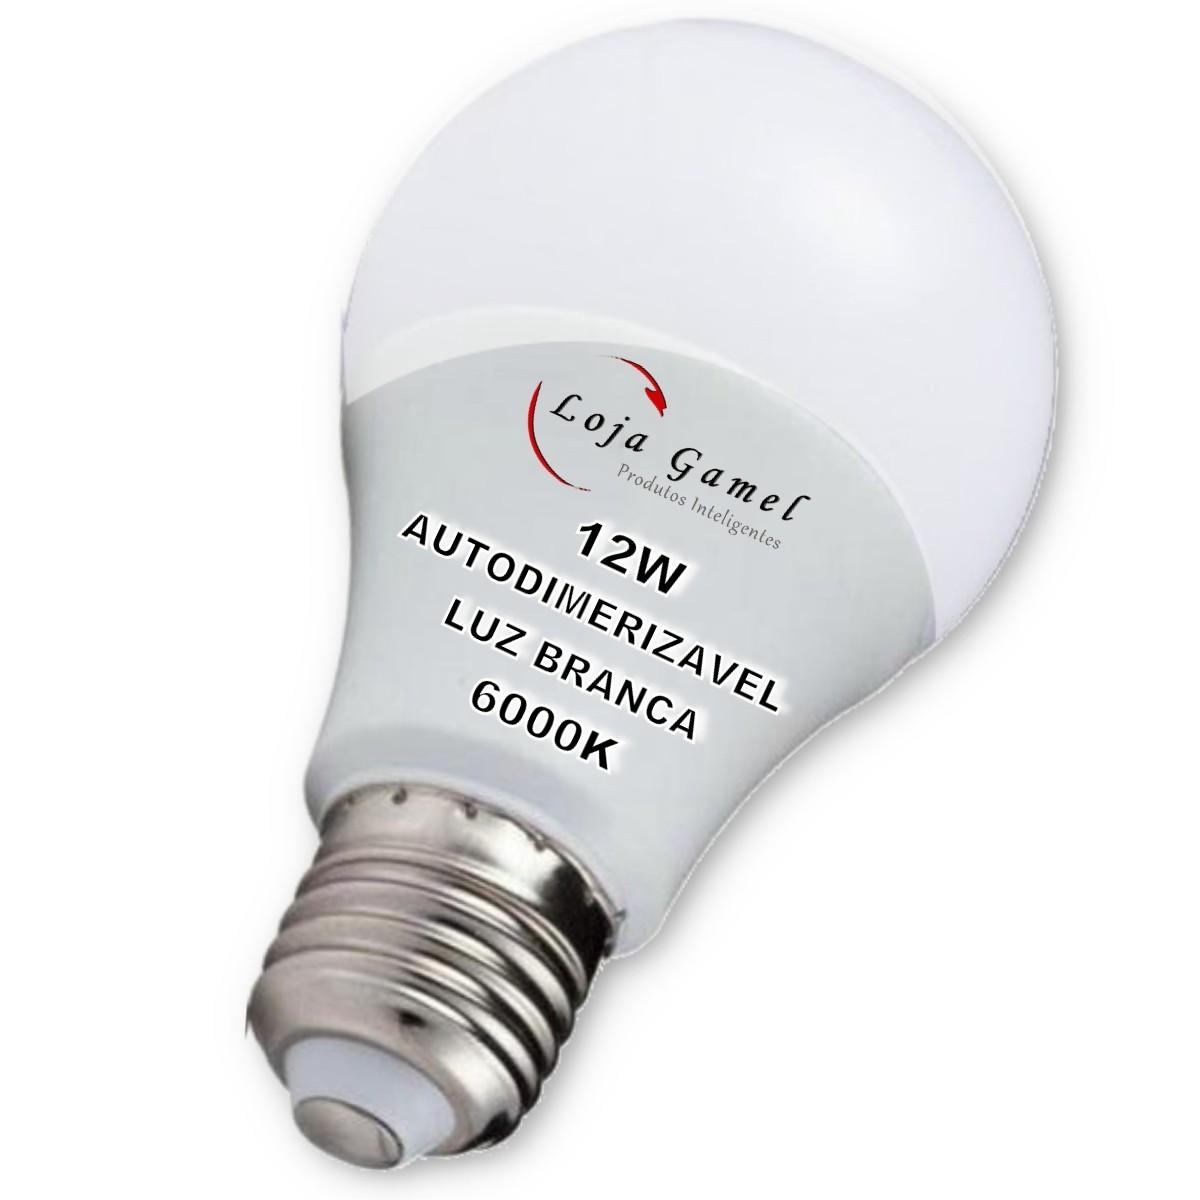 Foto3 - Lâmpada LED Bulbo Autodimerizável 12W Luz Branca 6000K Kit 2un